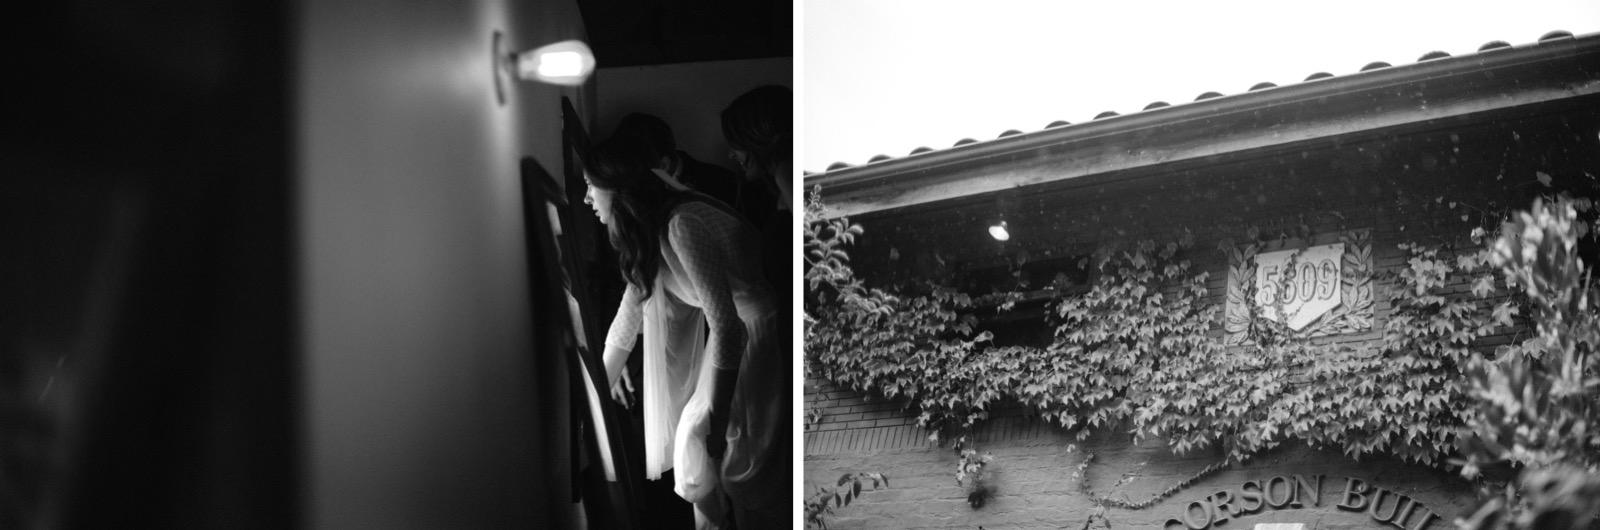 Corson_Building_Wedding_076.JPG